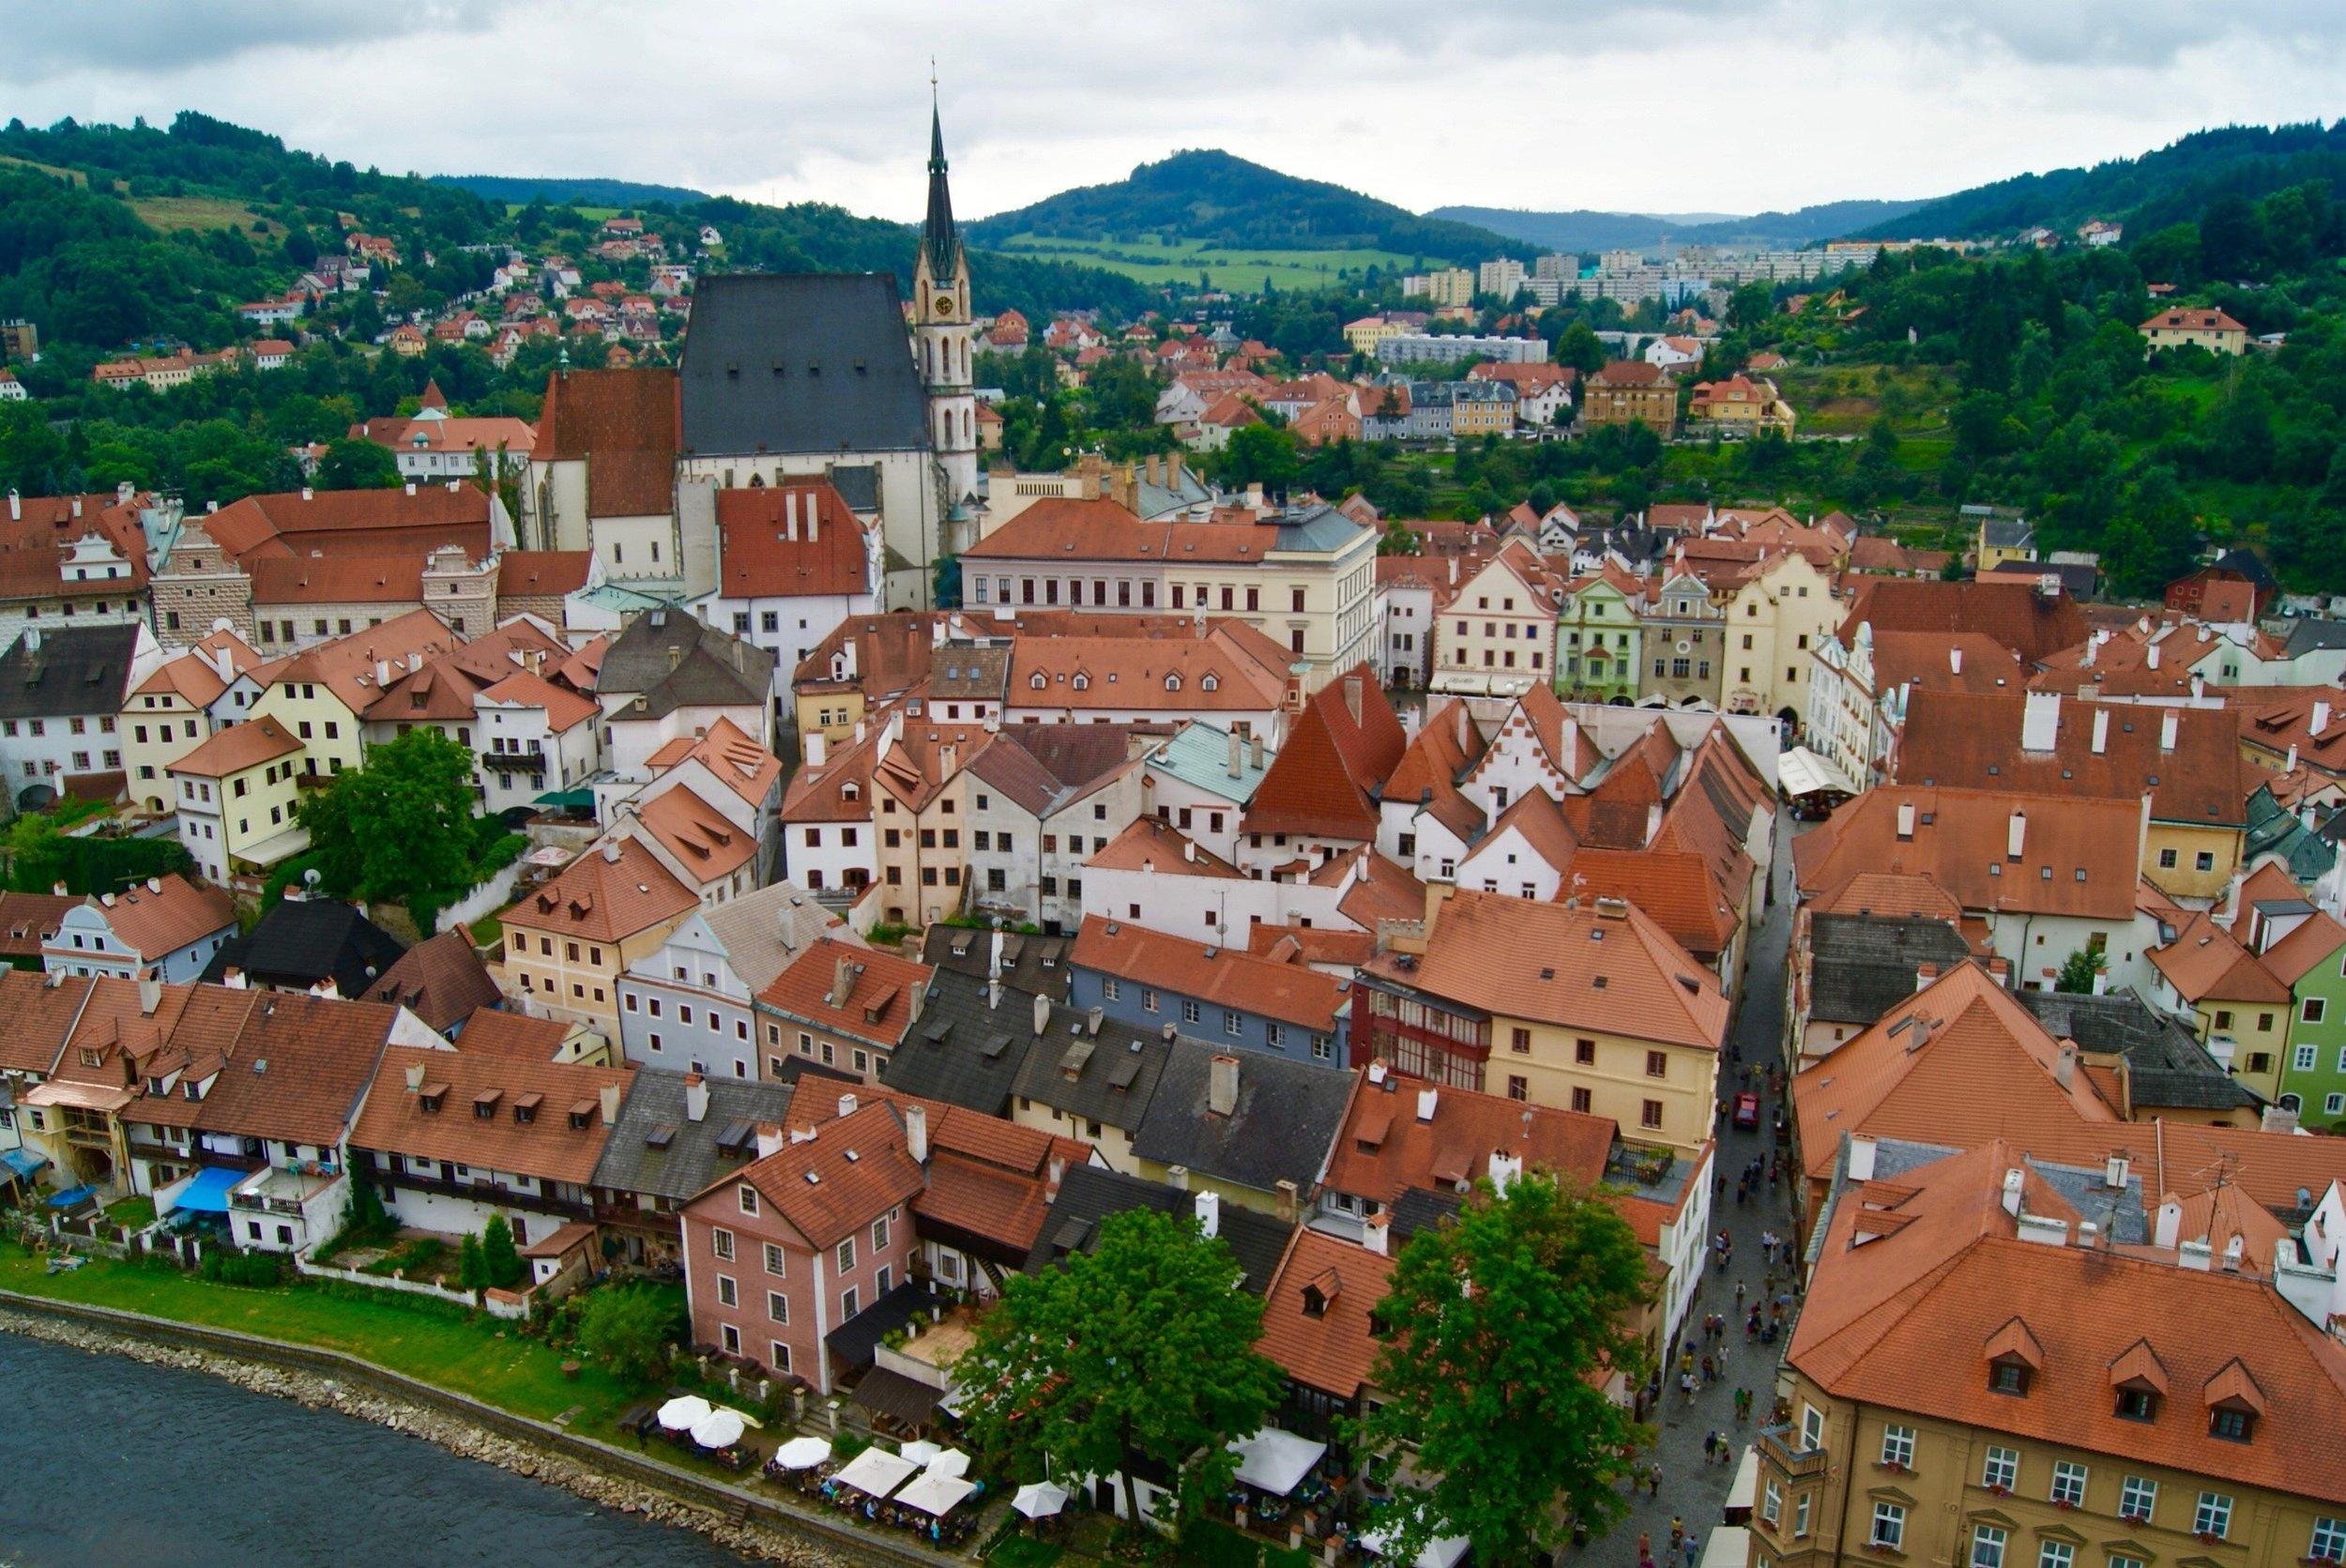 View of Český Krumlov from the tower